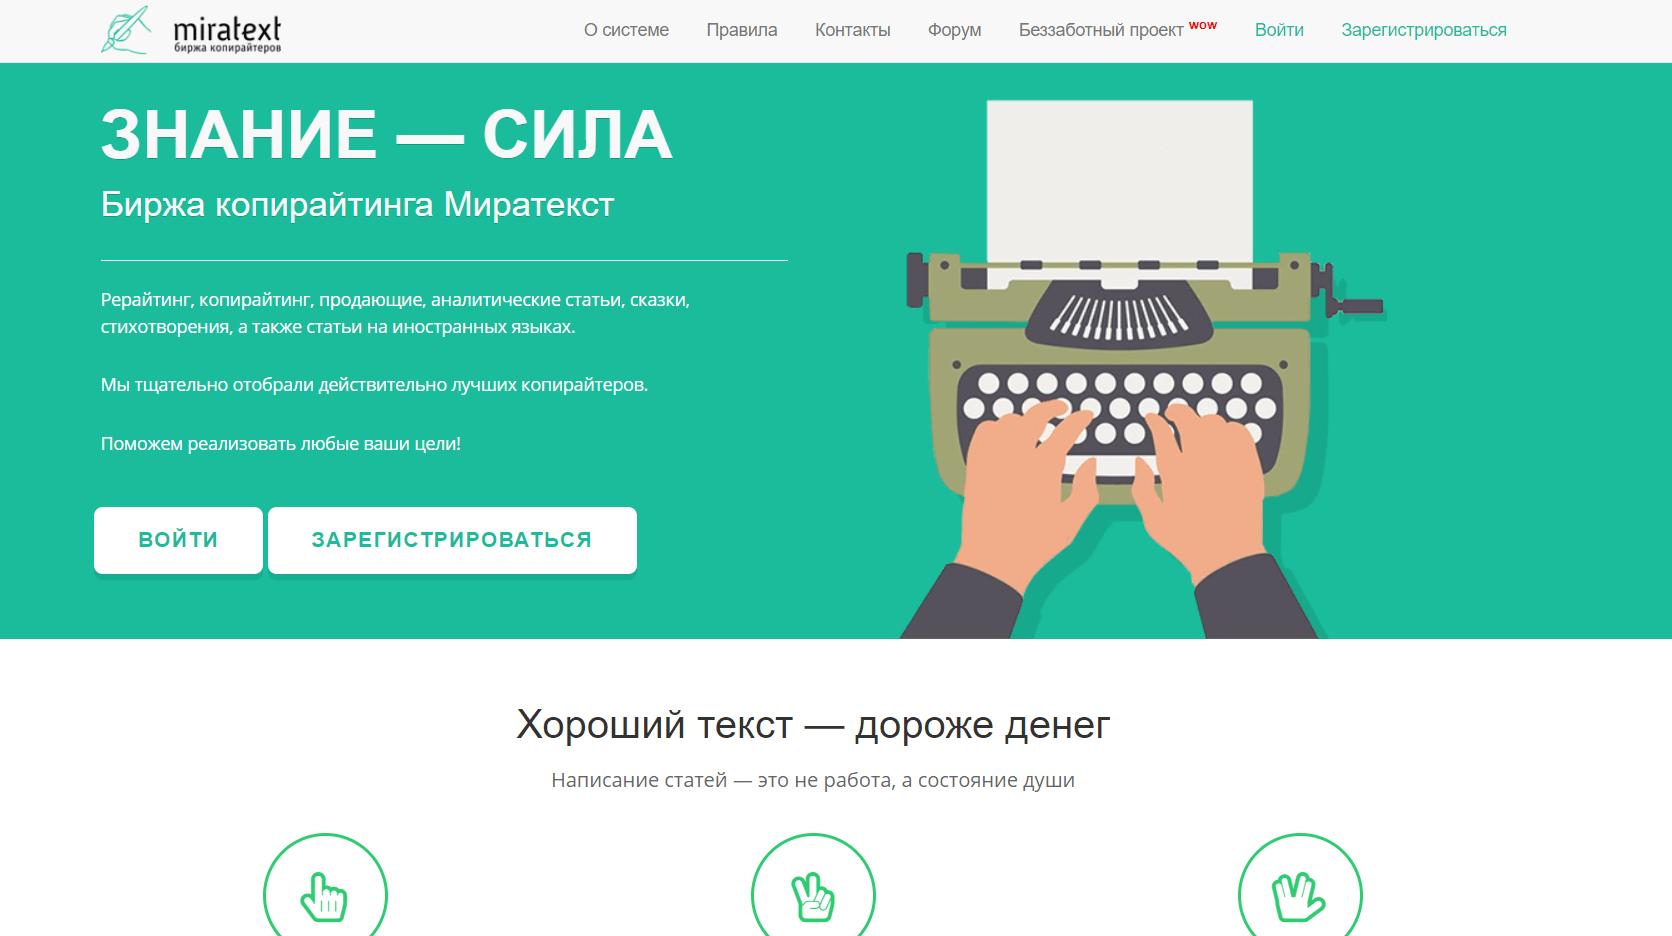 Miratext - биржа копирайтеров